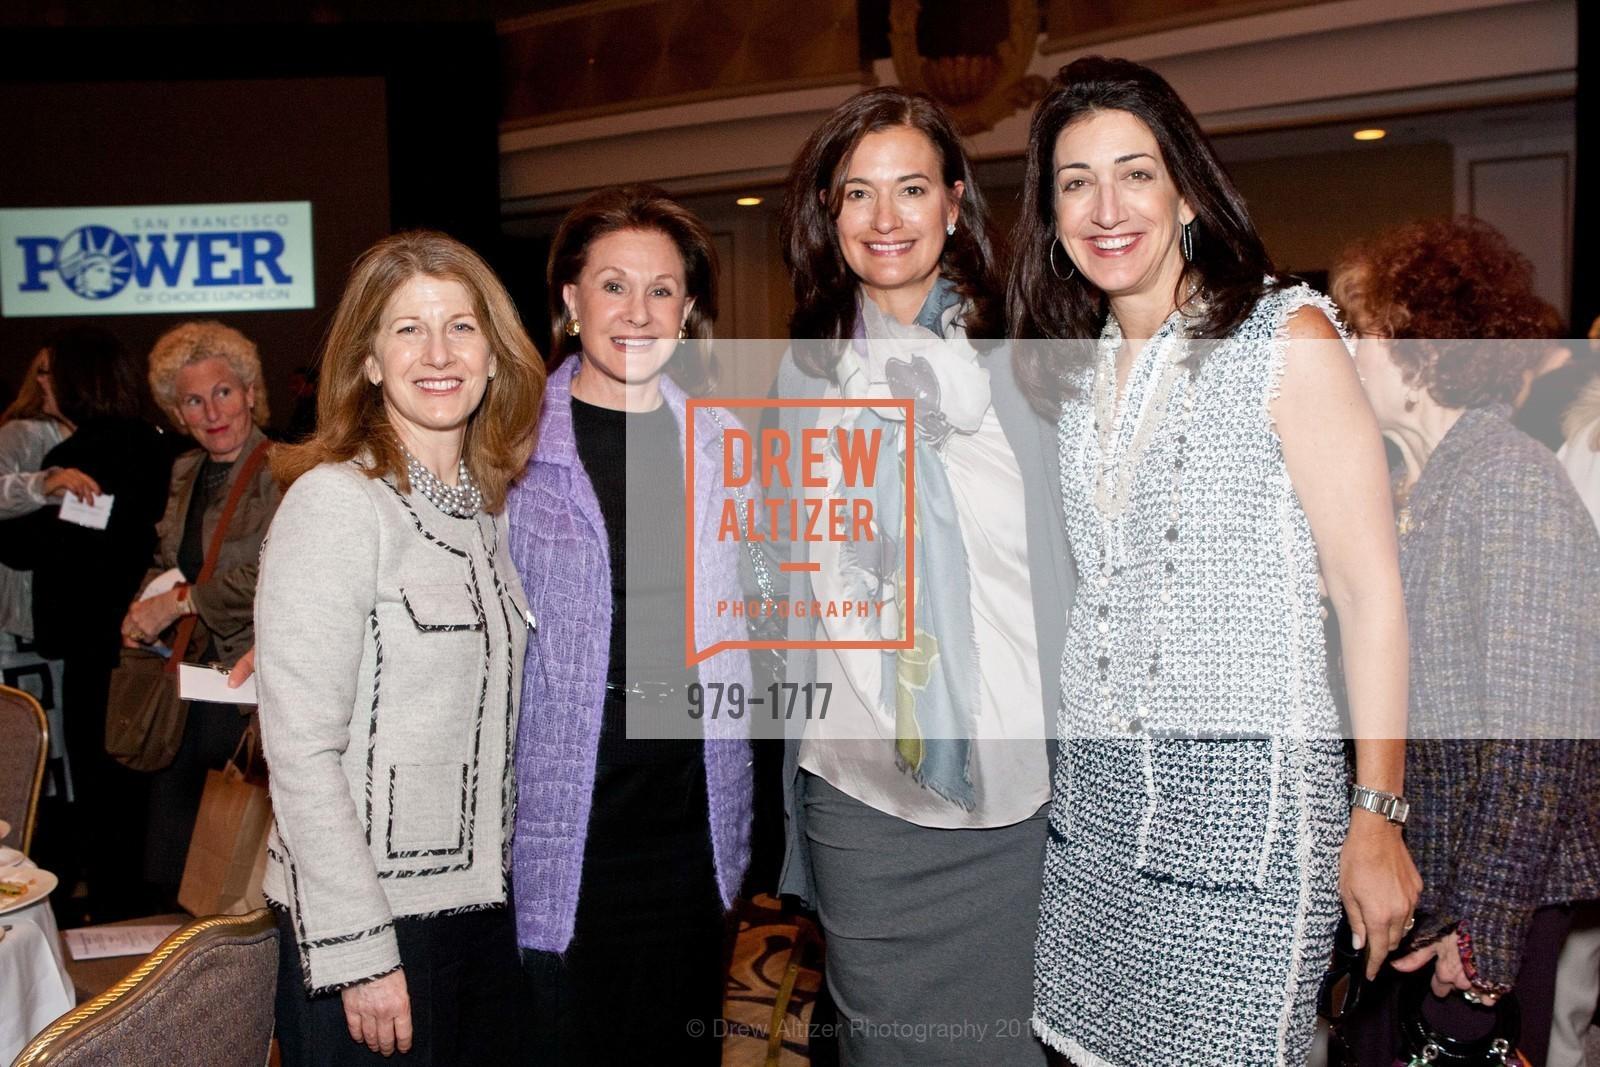 Diana Sansberg, Lucie Weissman, Angela Cohan, Pam Baer, Photo #979-1717